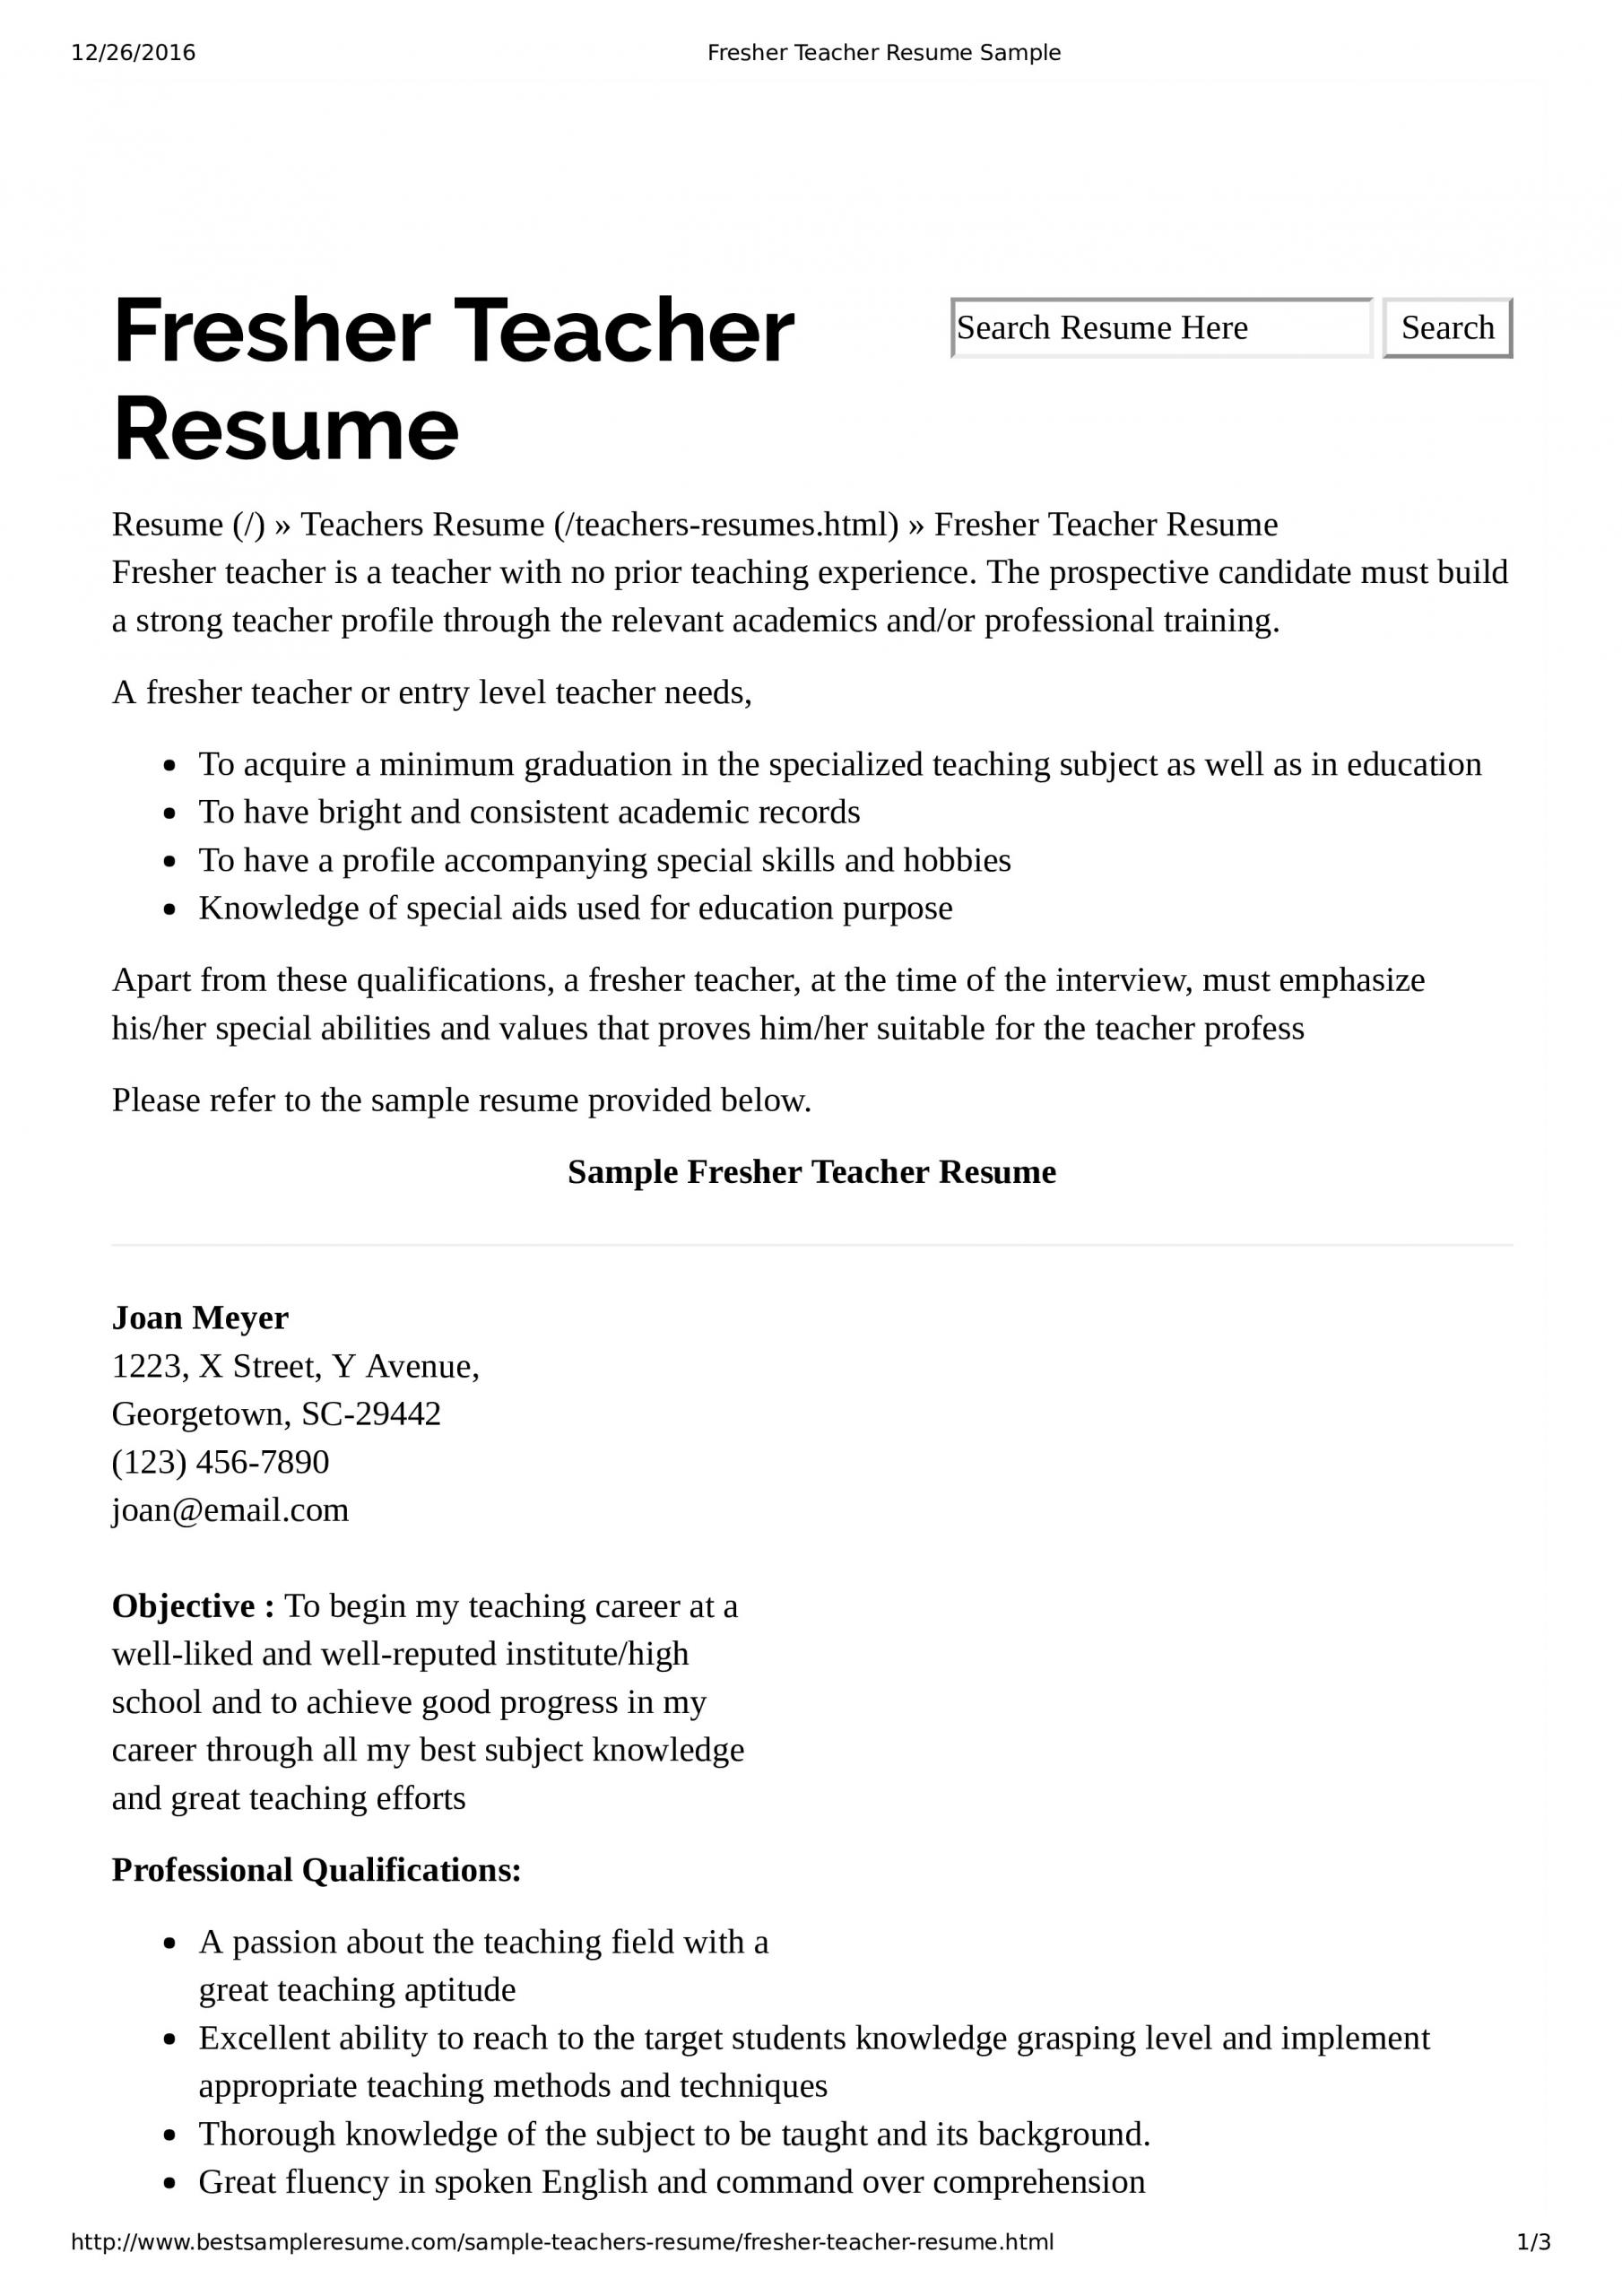 preschool teacher resume with no experience